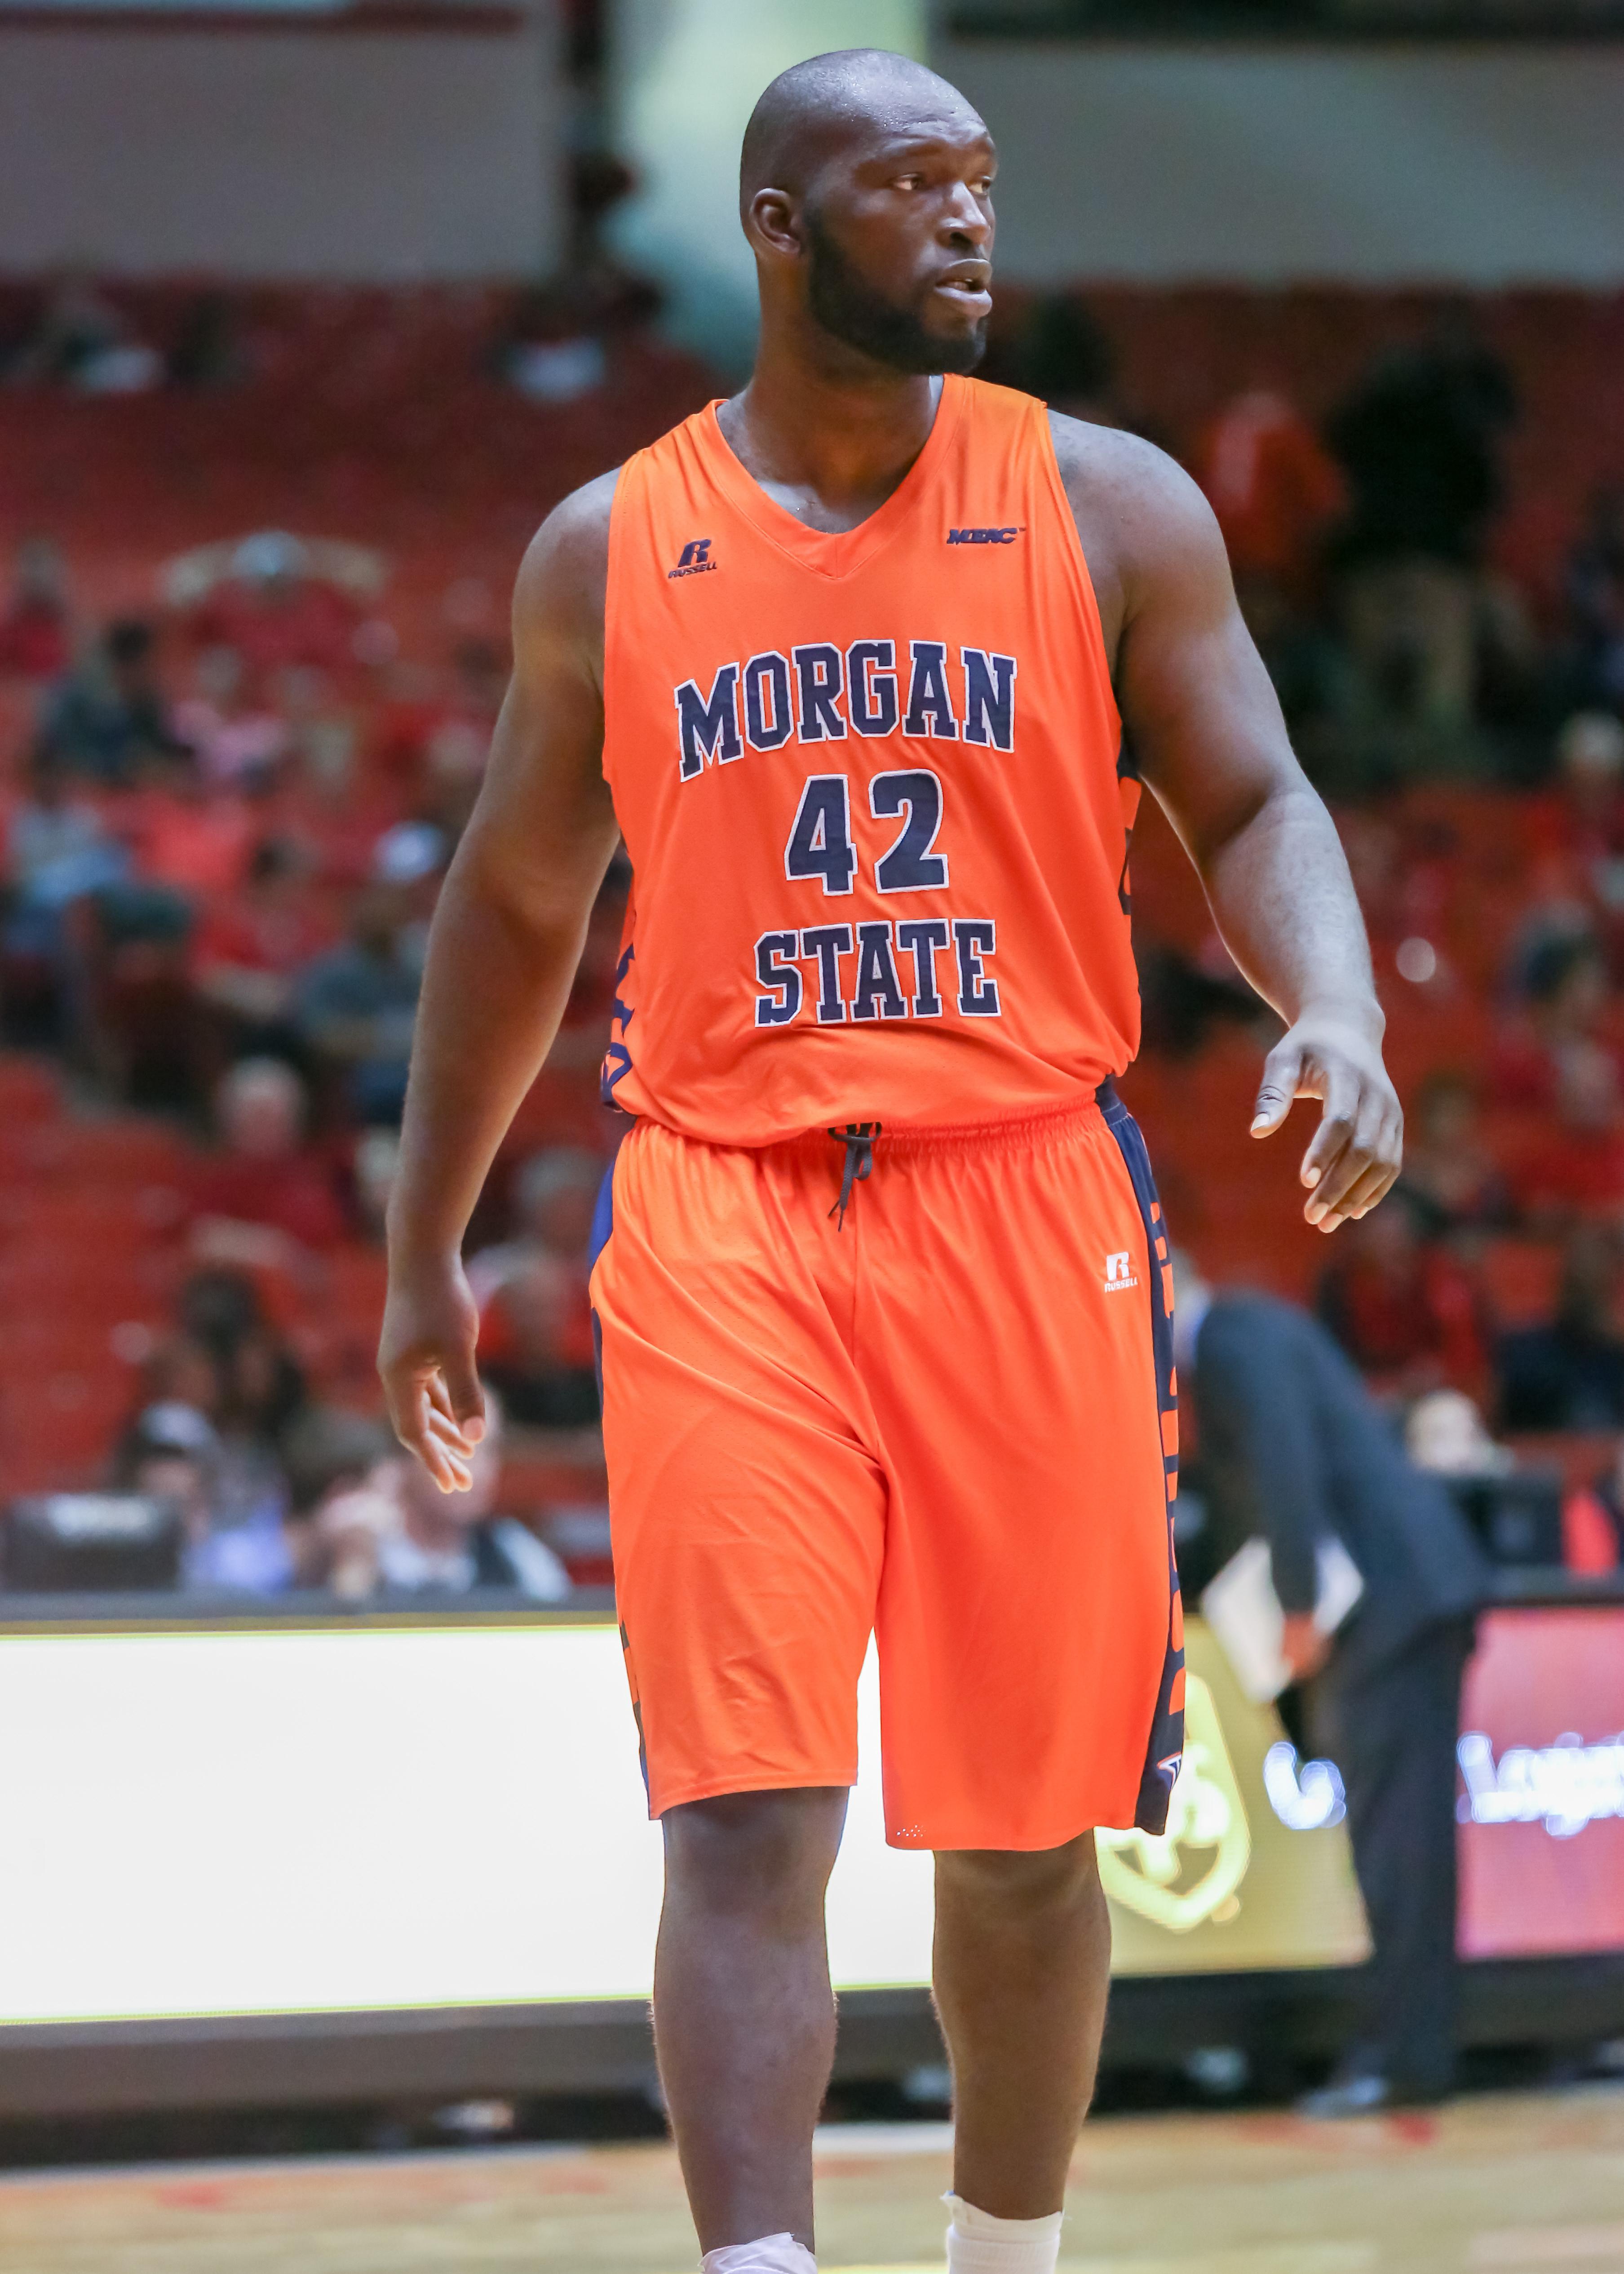 NCAA BASKETBALL: NOV 22 Morgan State at Houston